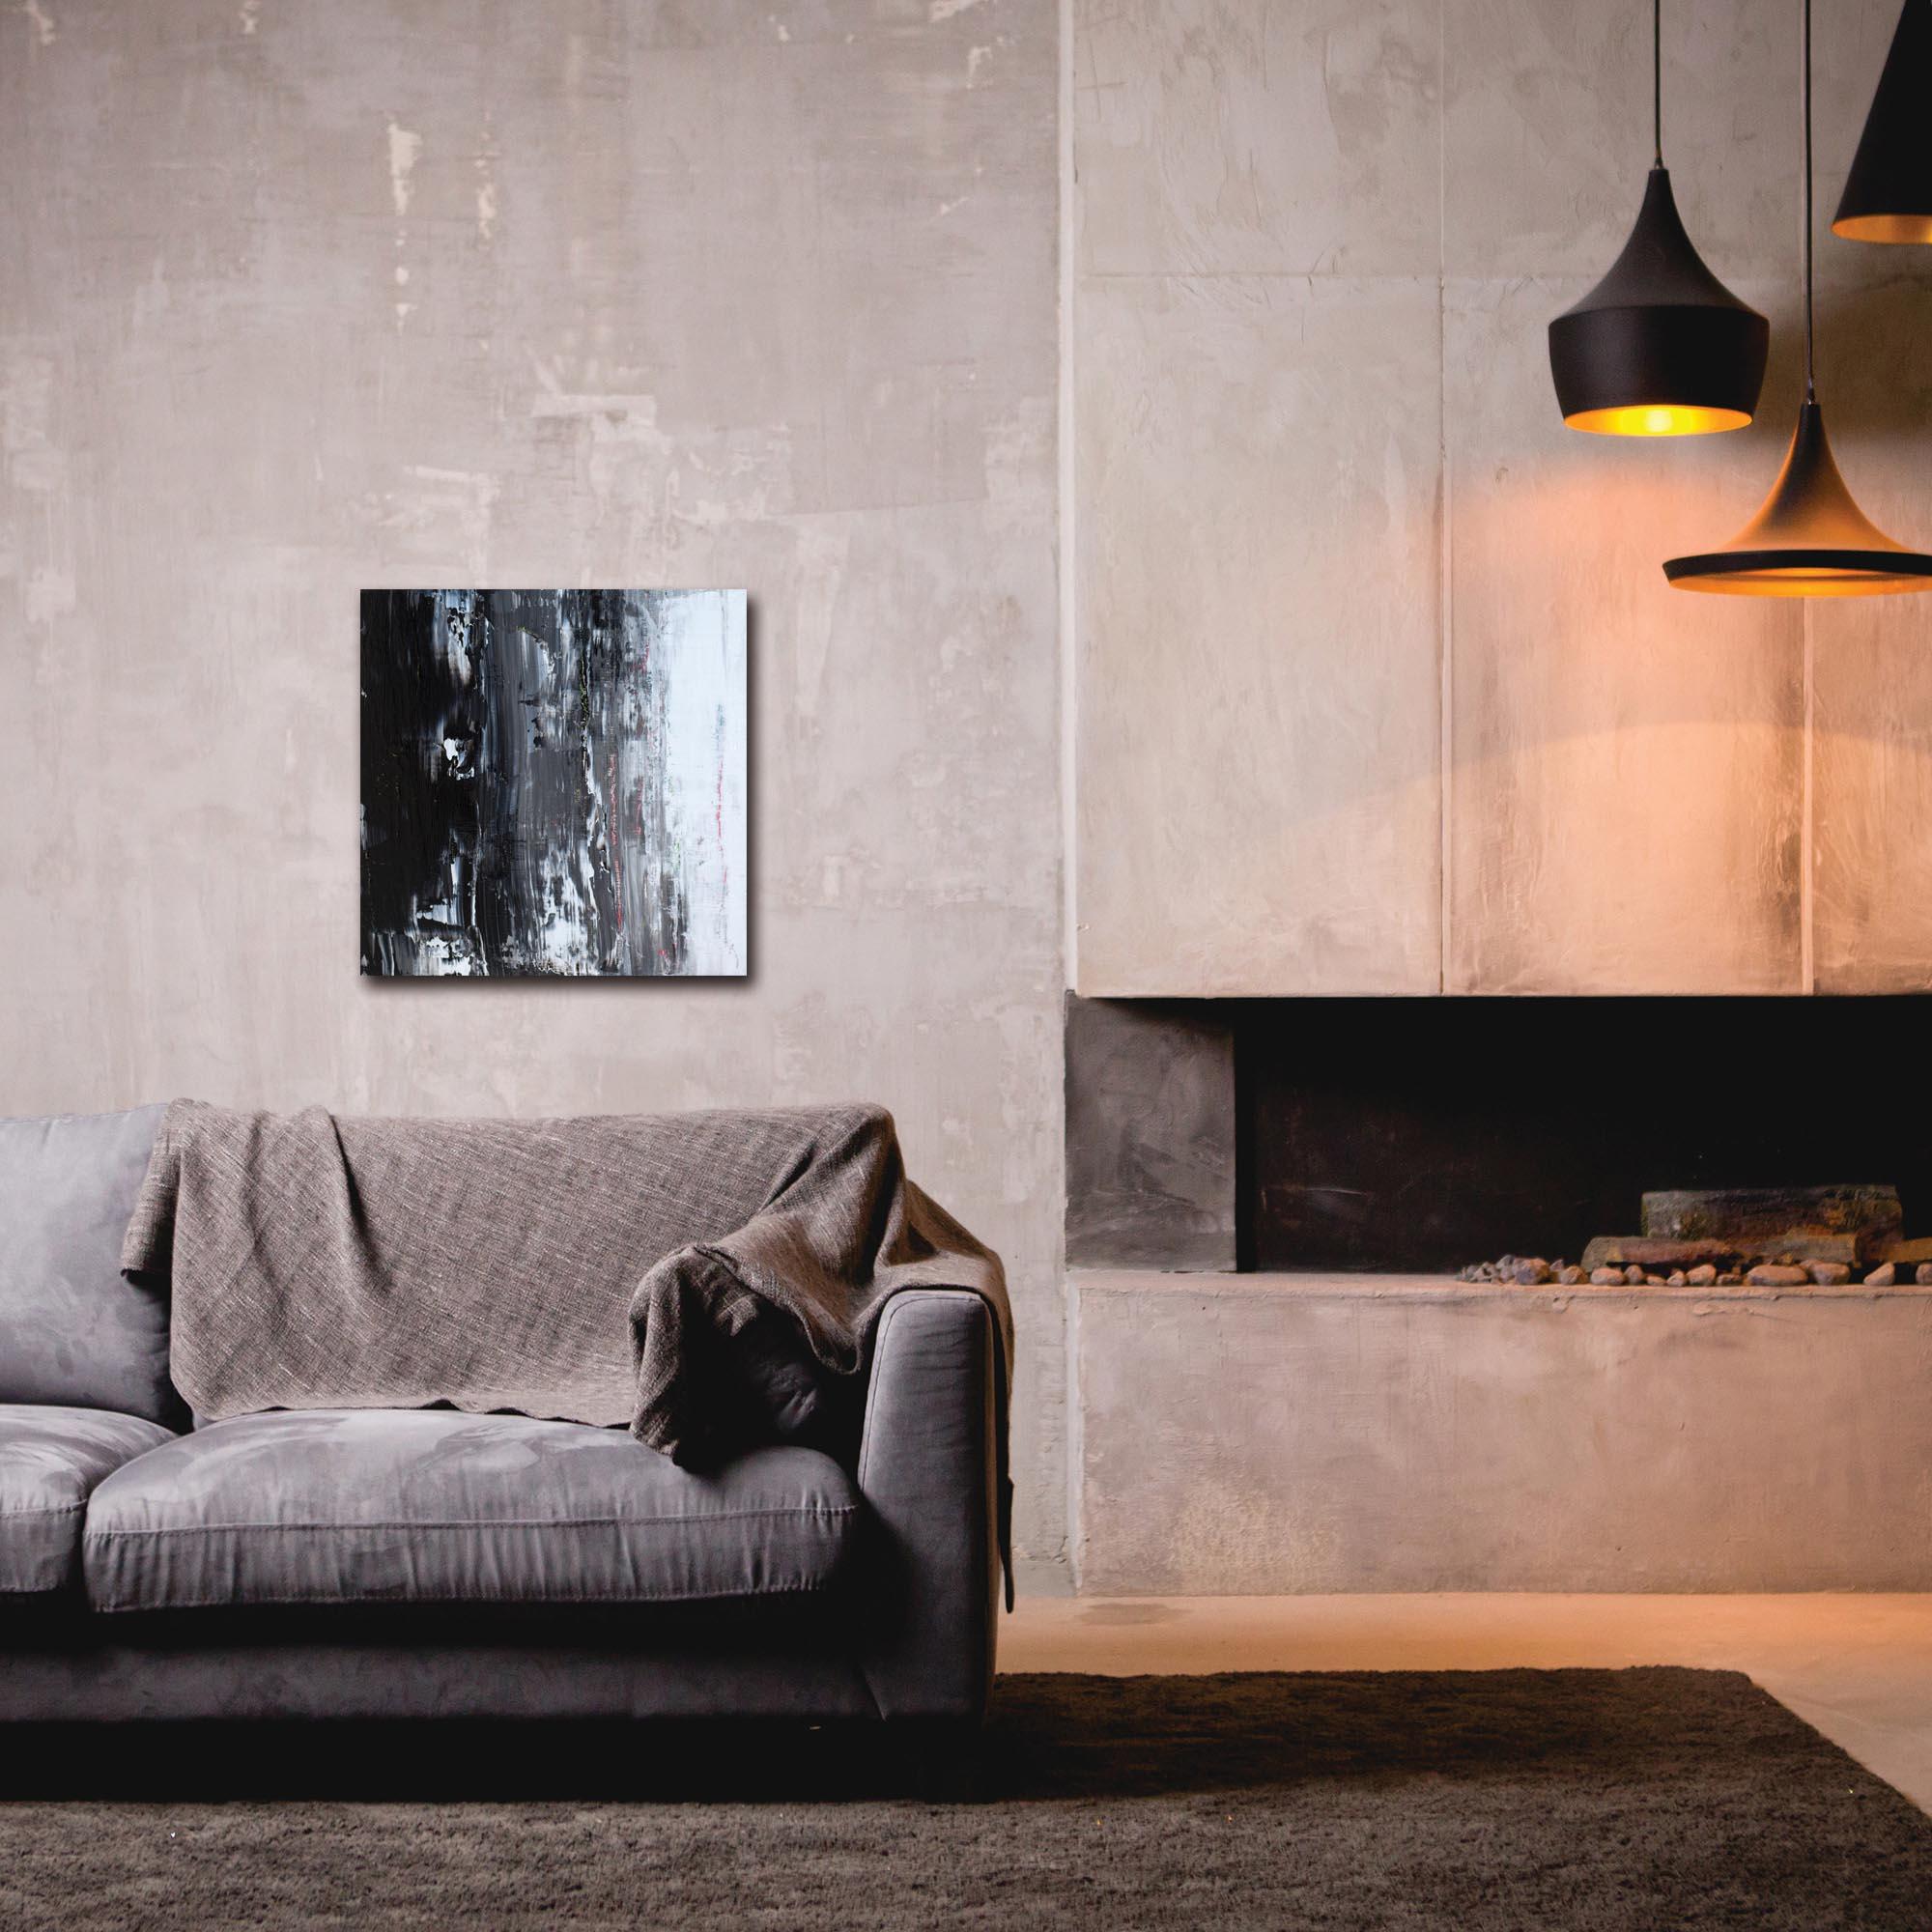 Abstract Wall Art 'Urban Life 11' - Urban Decor on Metal or Plexiglass - Lifestyle View